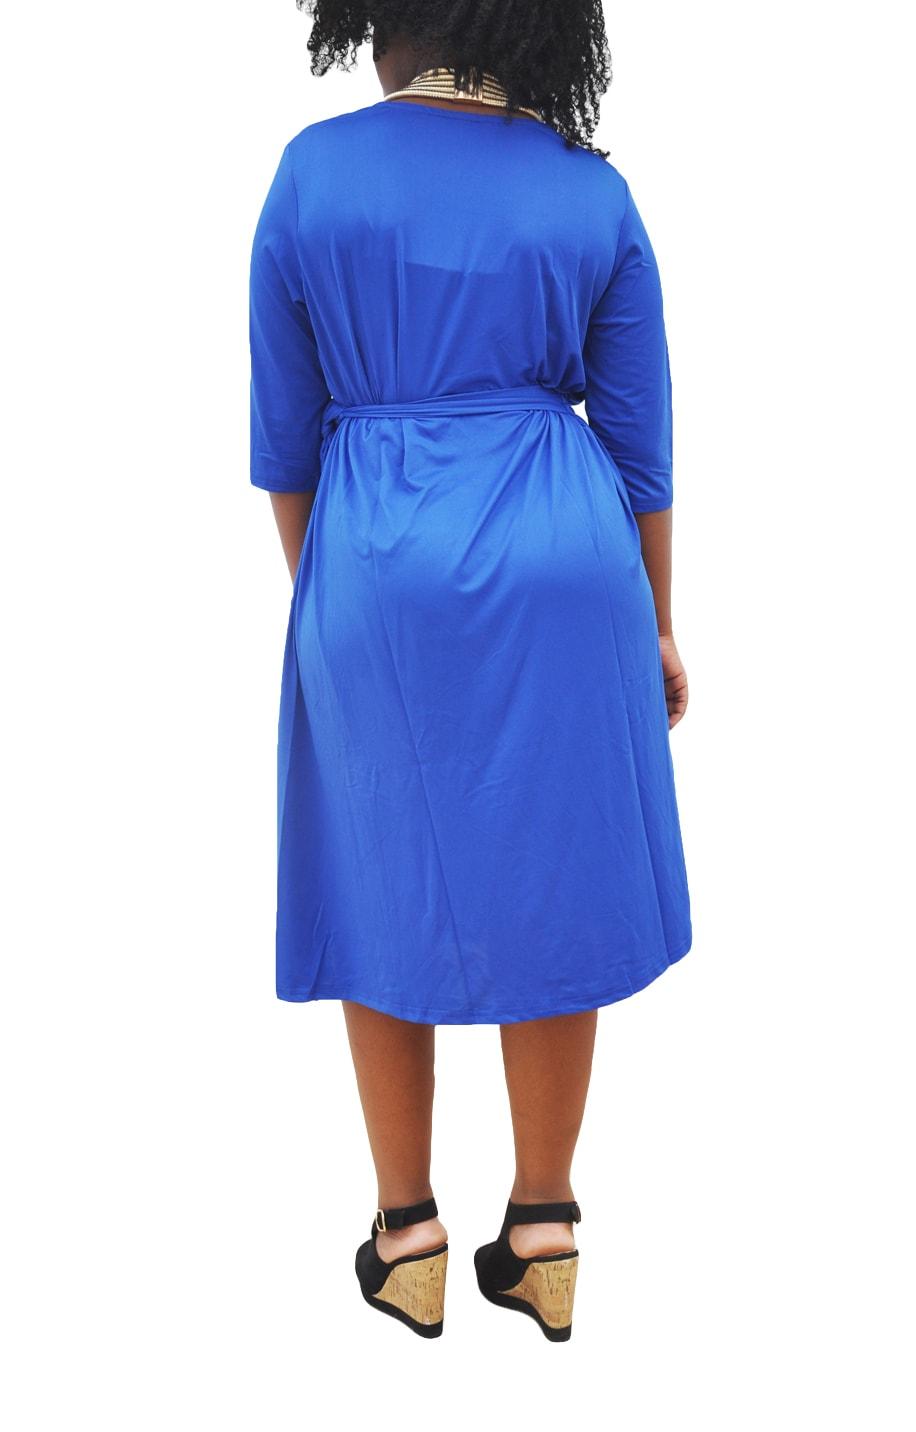 M0281 blue5 Short Sleeve Dresses maureens.com boutique